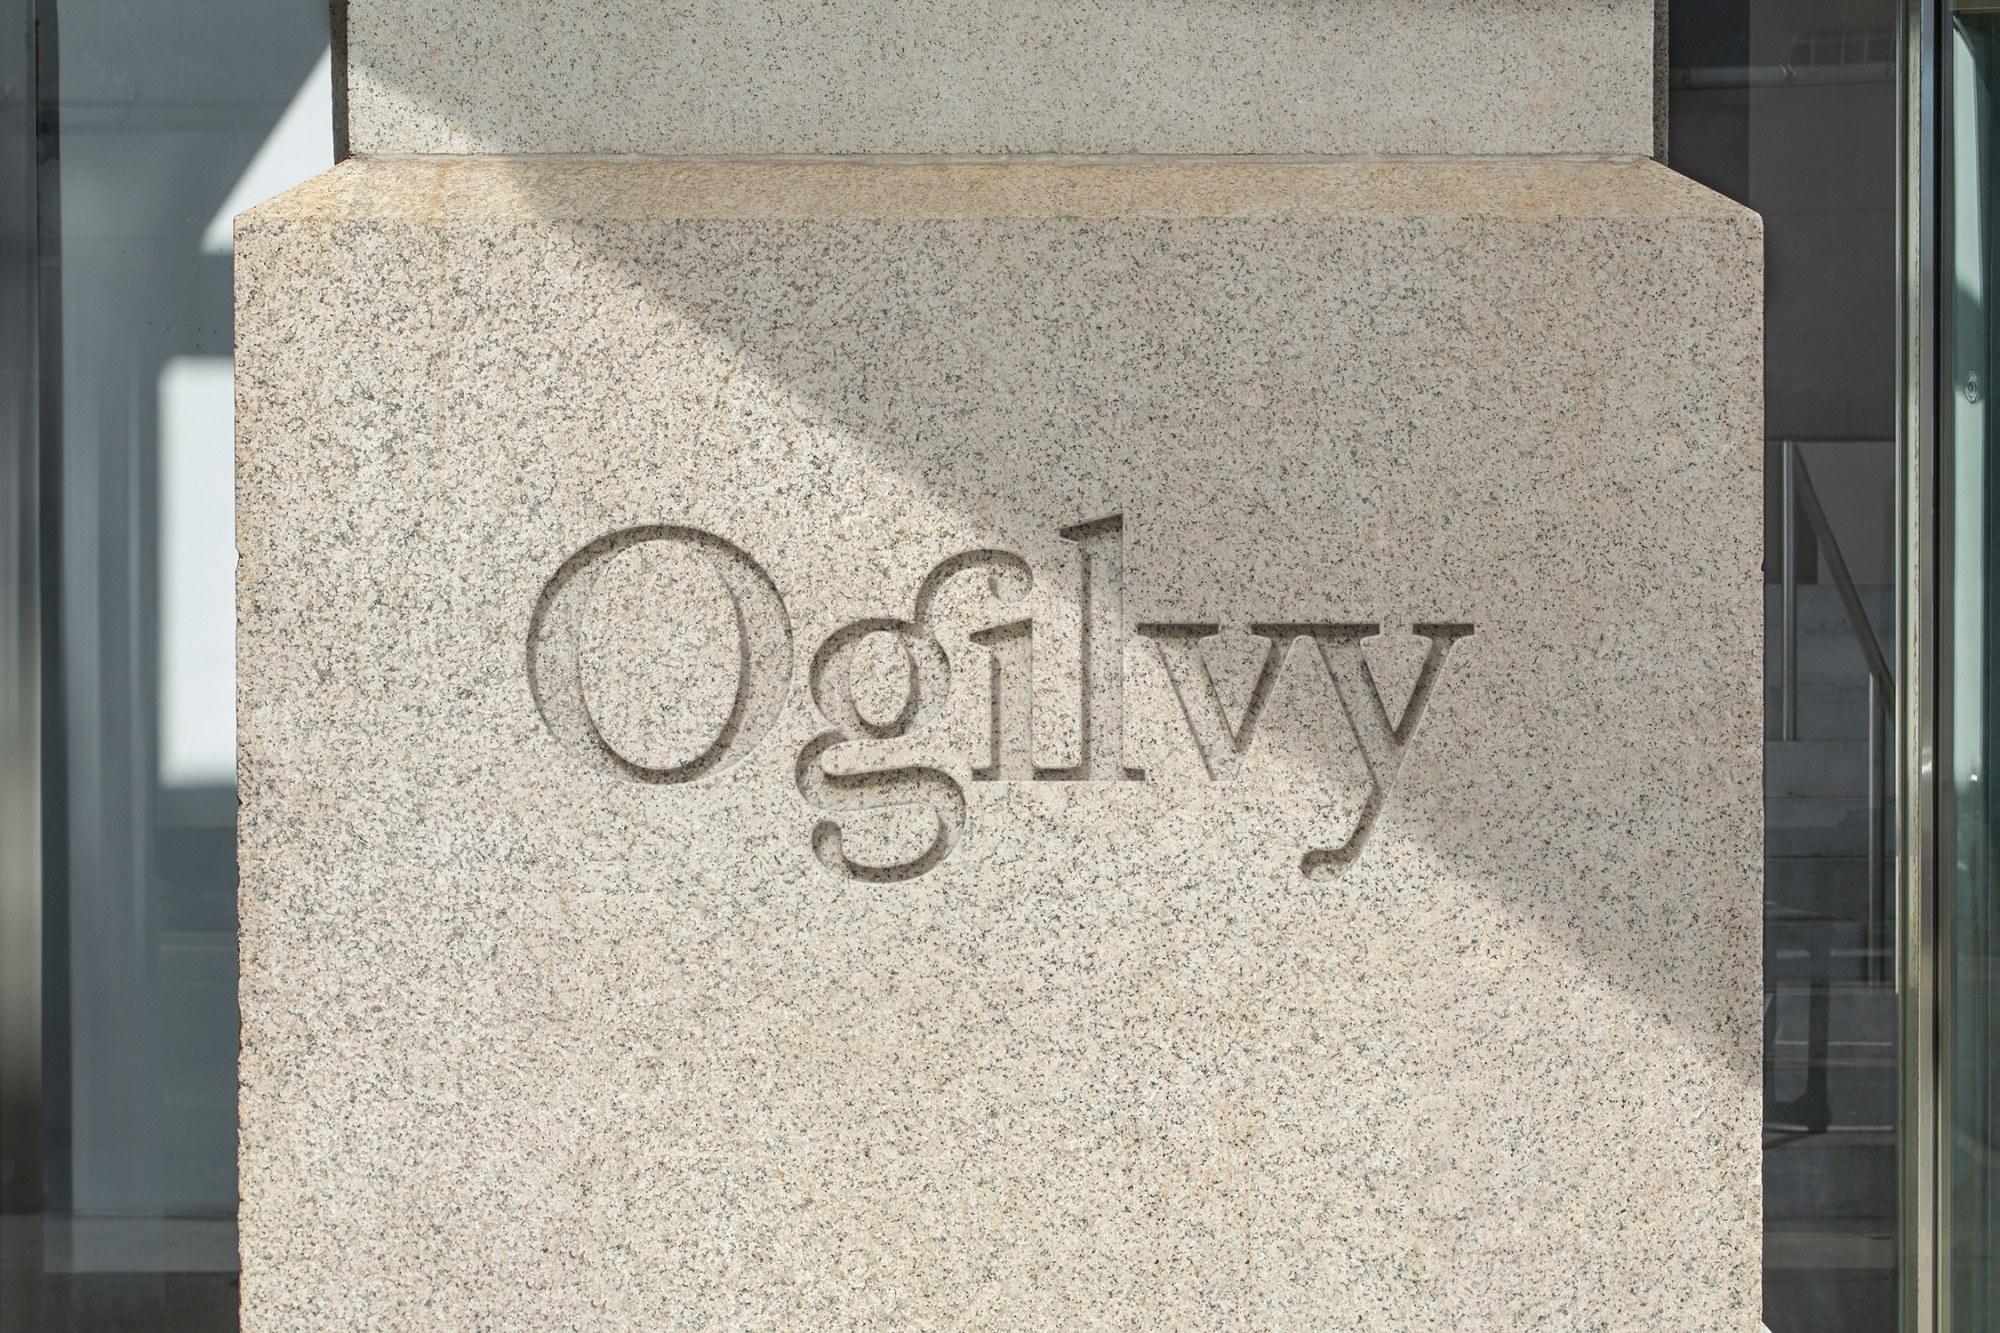 Ogilvy typeface